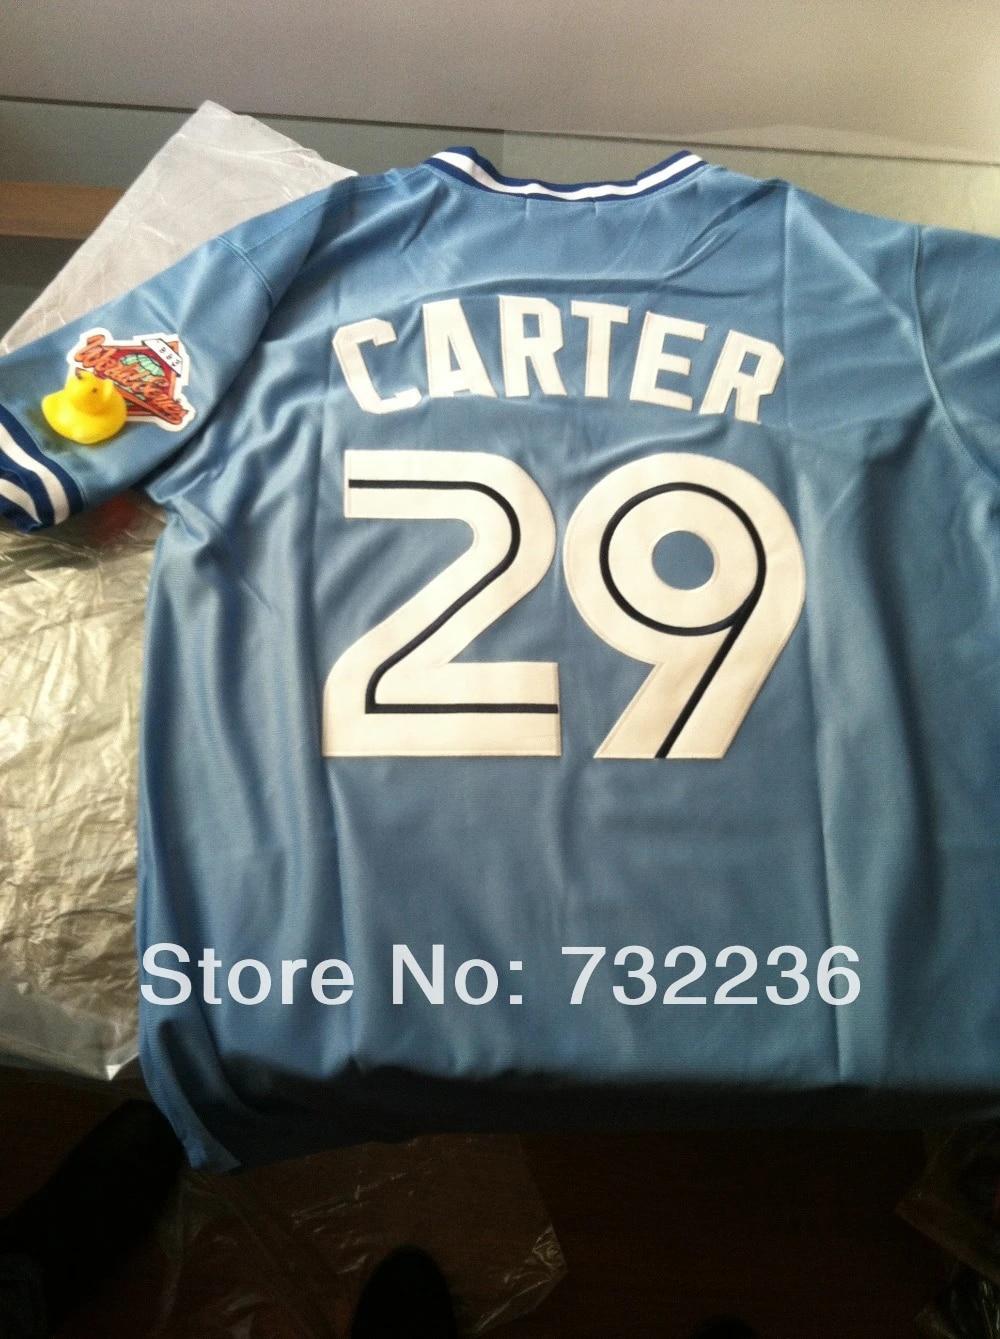 Buy Discount/ stitched Toronto Blue Jays #29 Joe Carter blue throwback retro Baseball Jerseys men's baseball jersey/ shirt